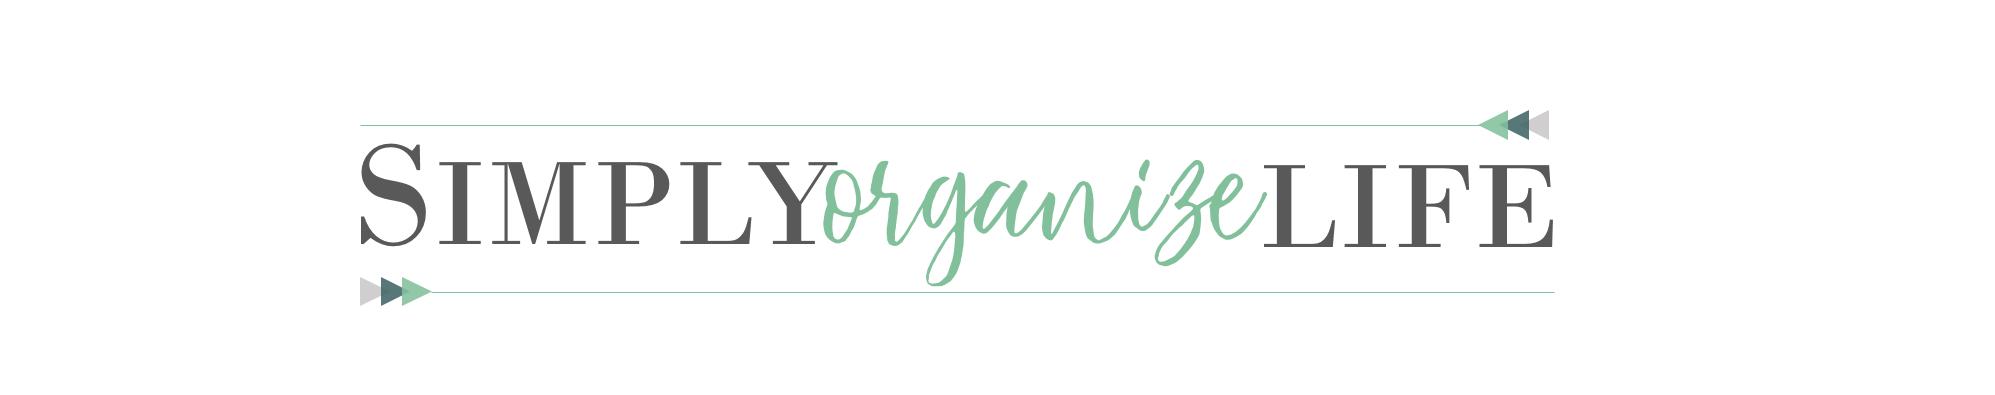 Simply Organize Life